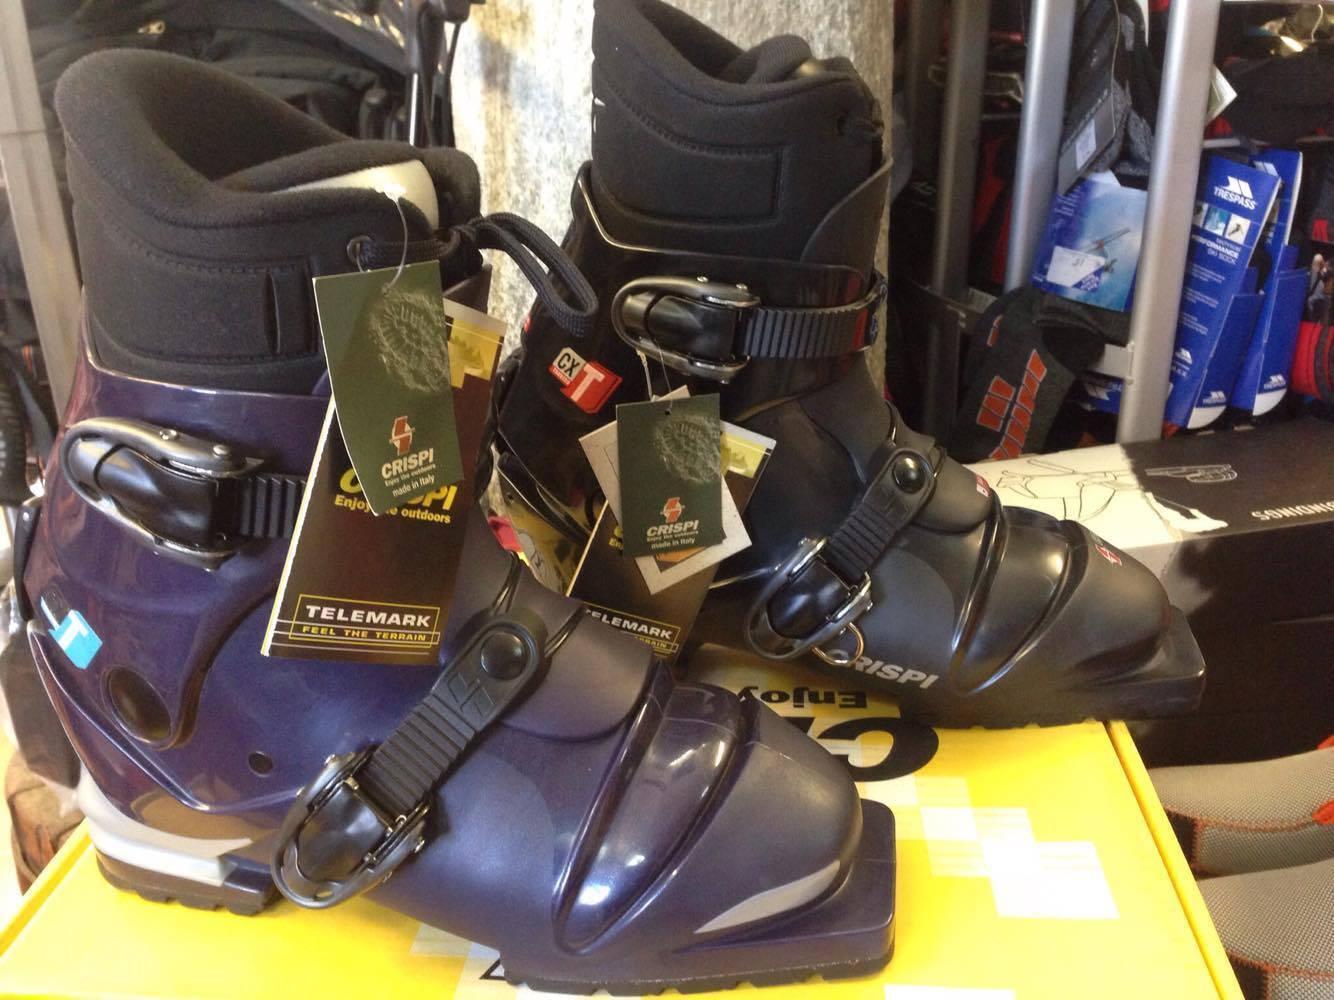 Crispi CXT scarponi da telemark fondo escursionismo 75mm backcountry ski stivali